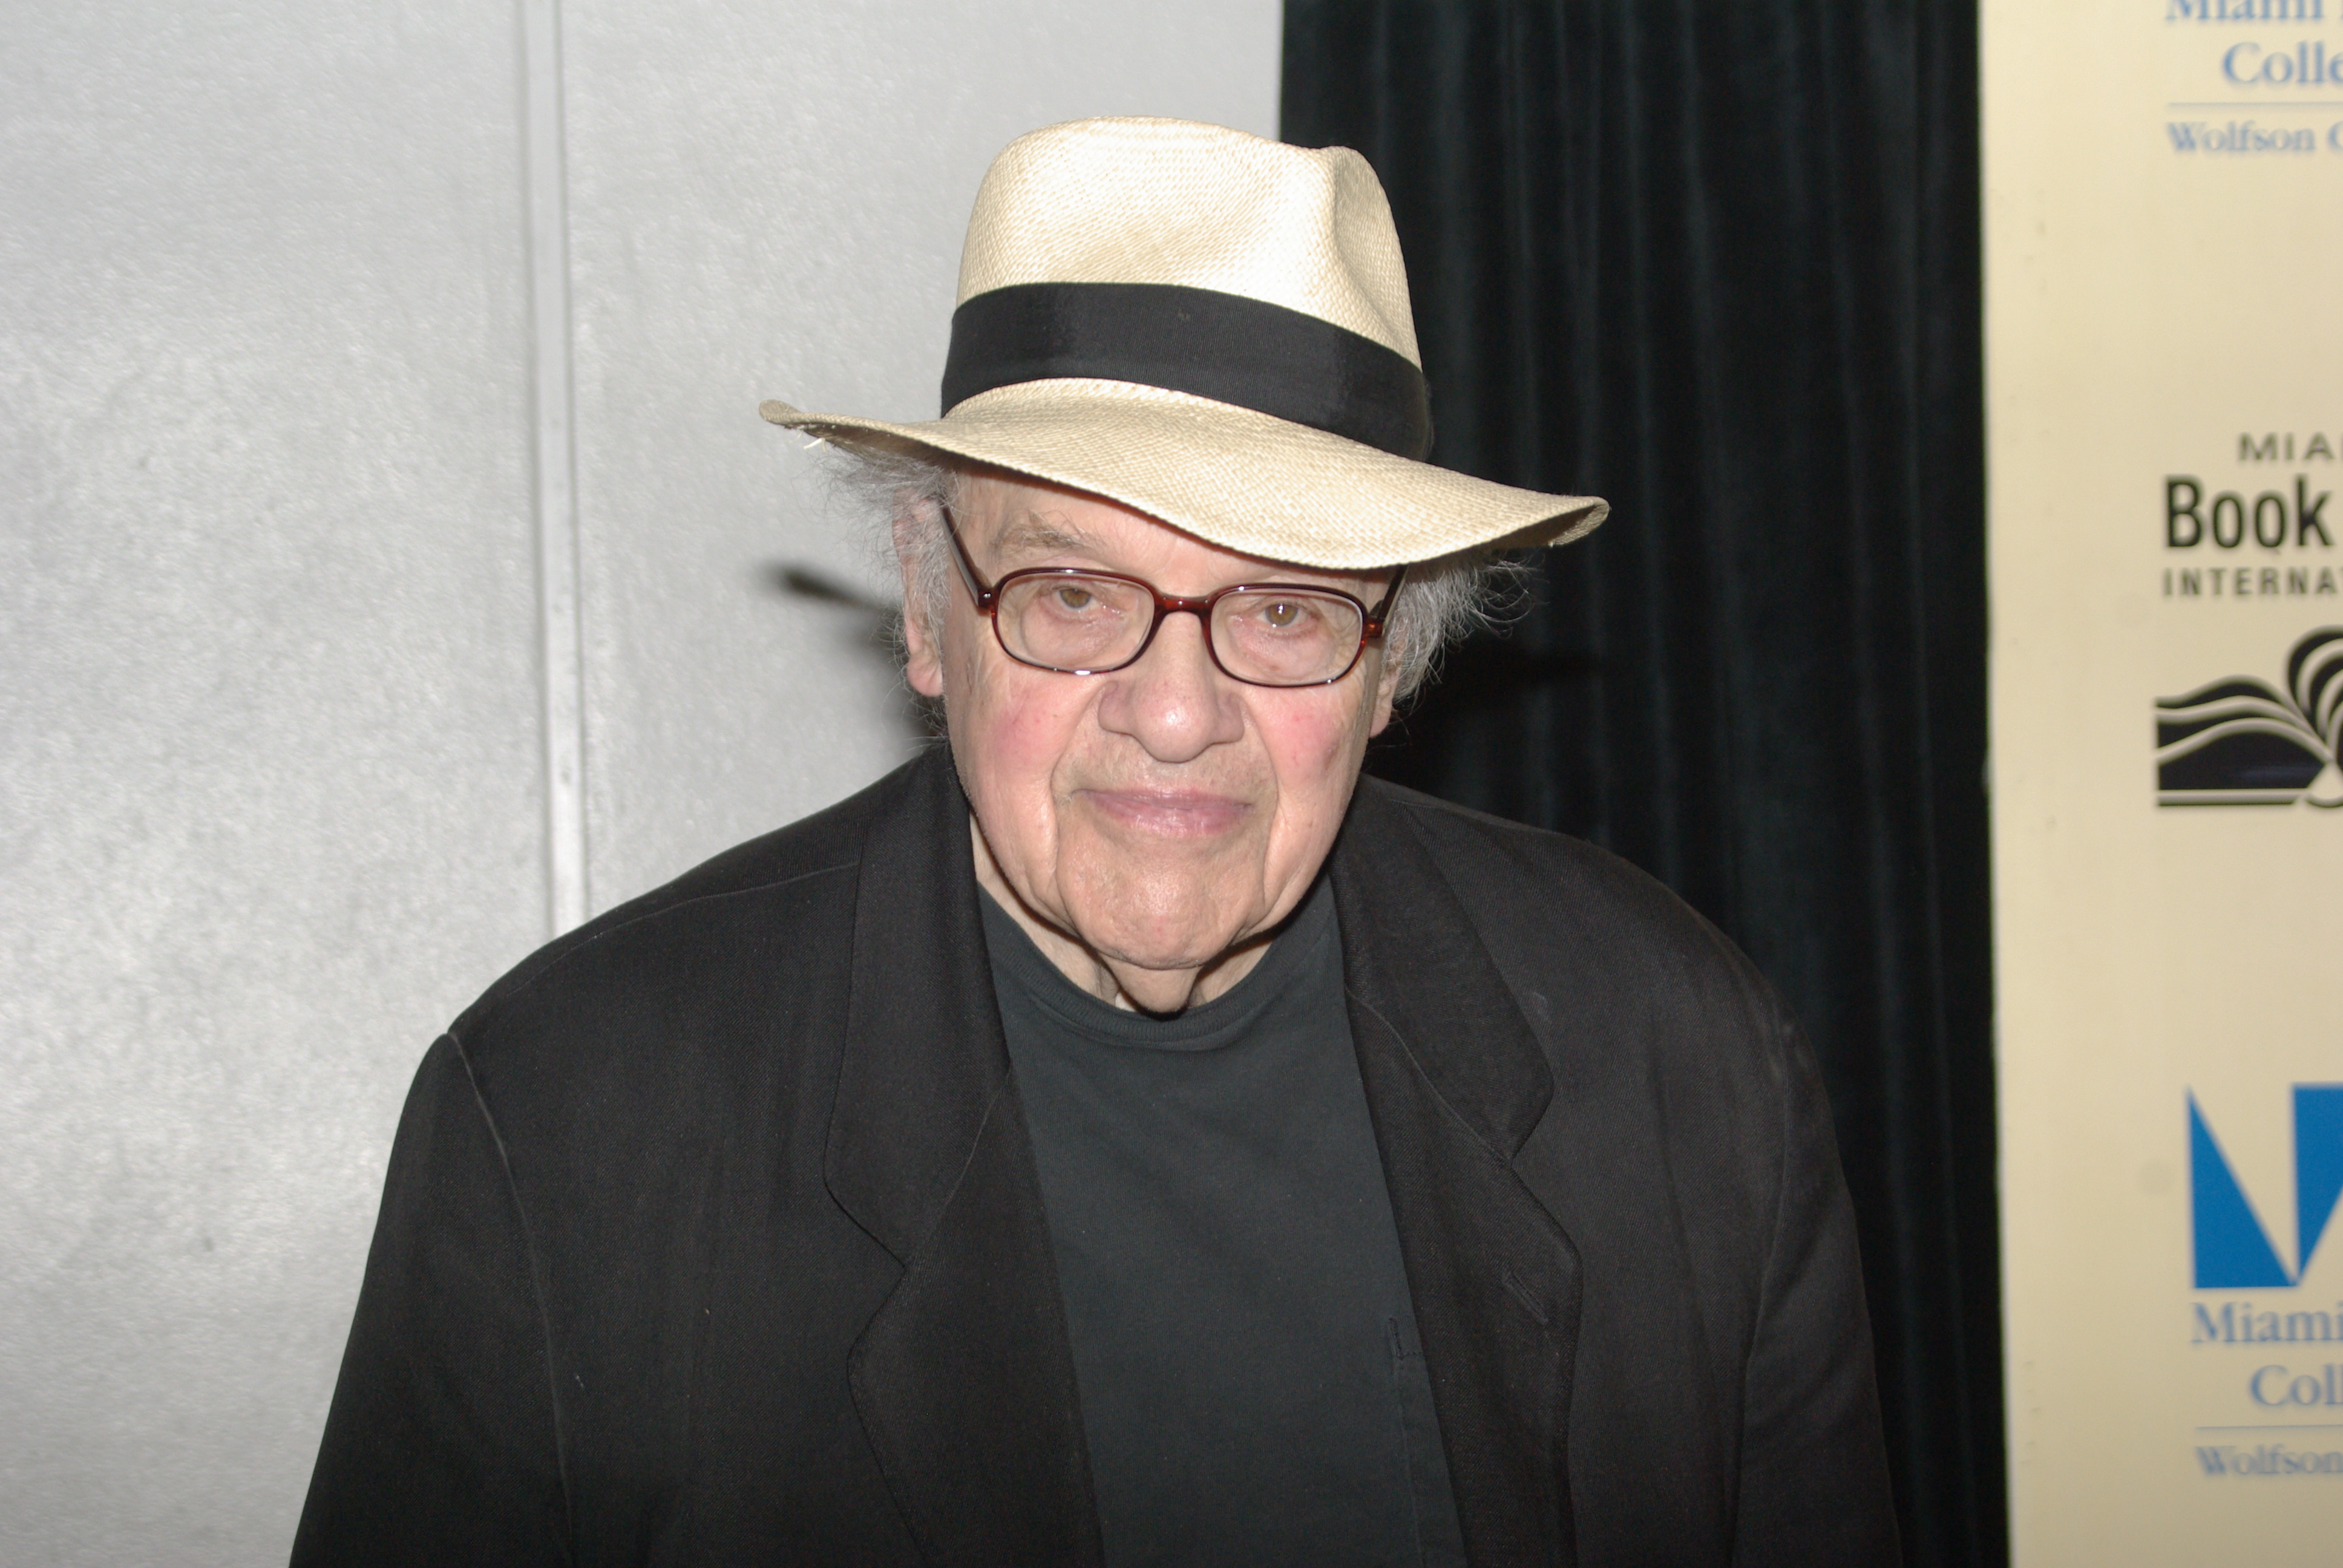 Gerald Stern at the [[Miami Book Fair International]] in 2011